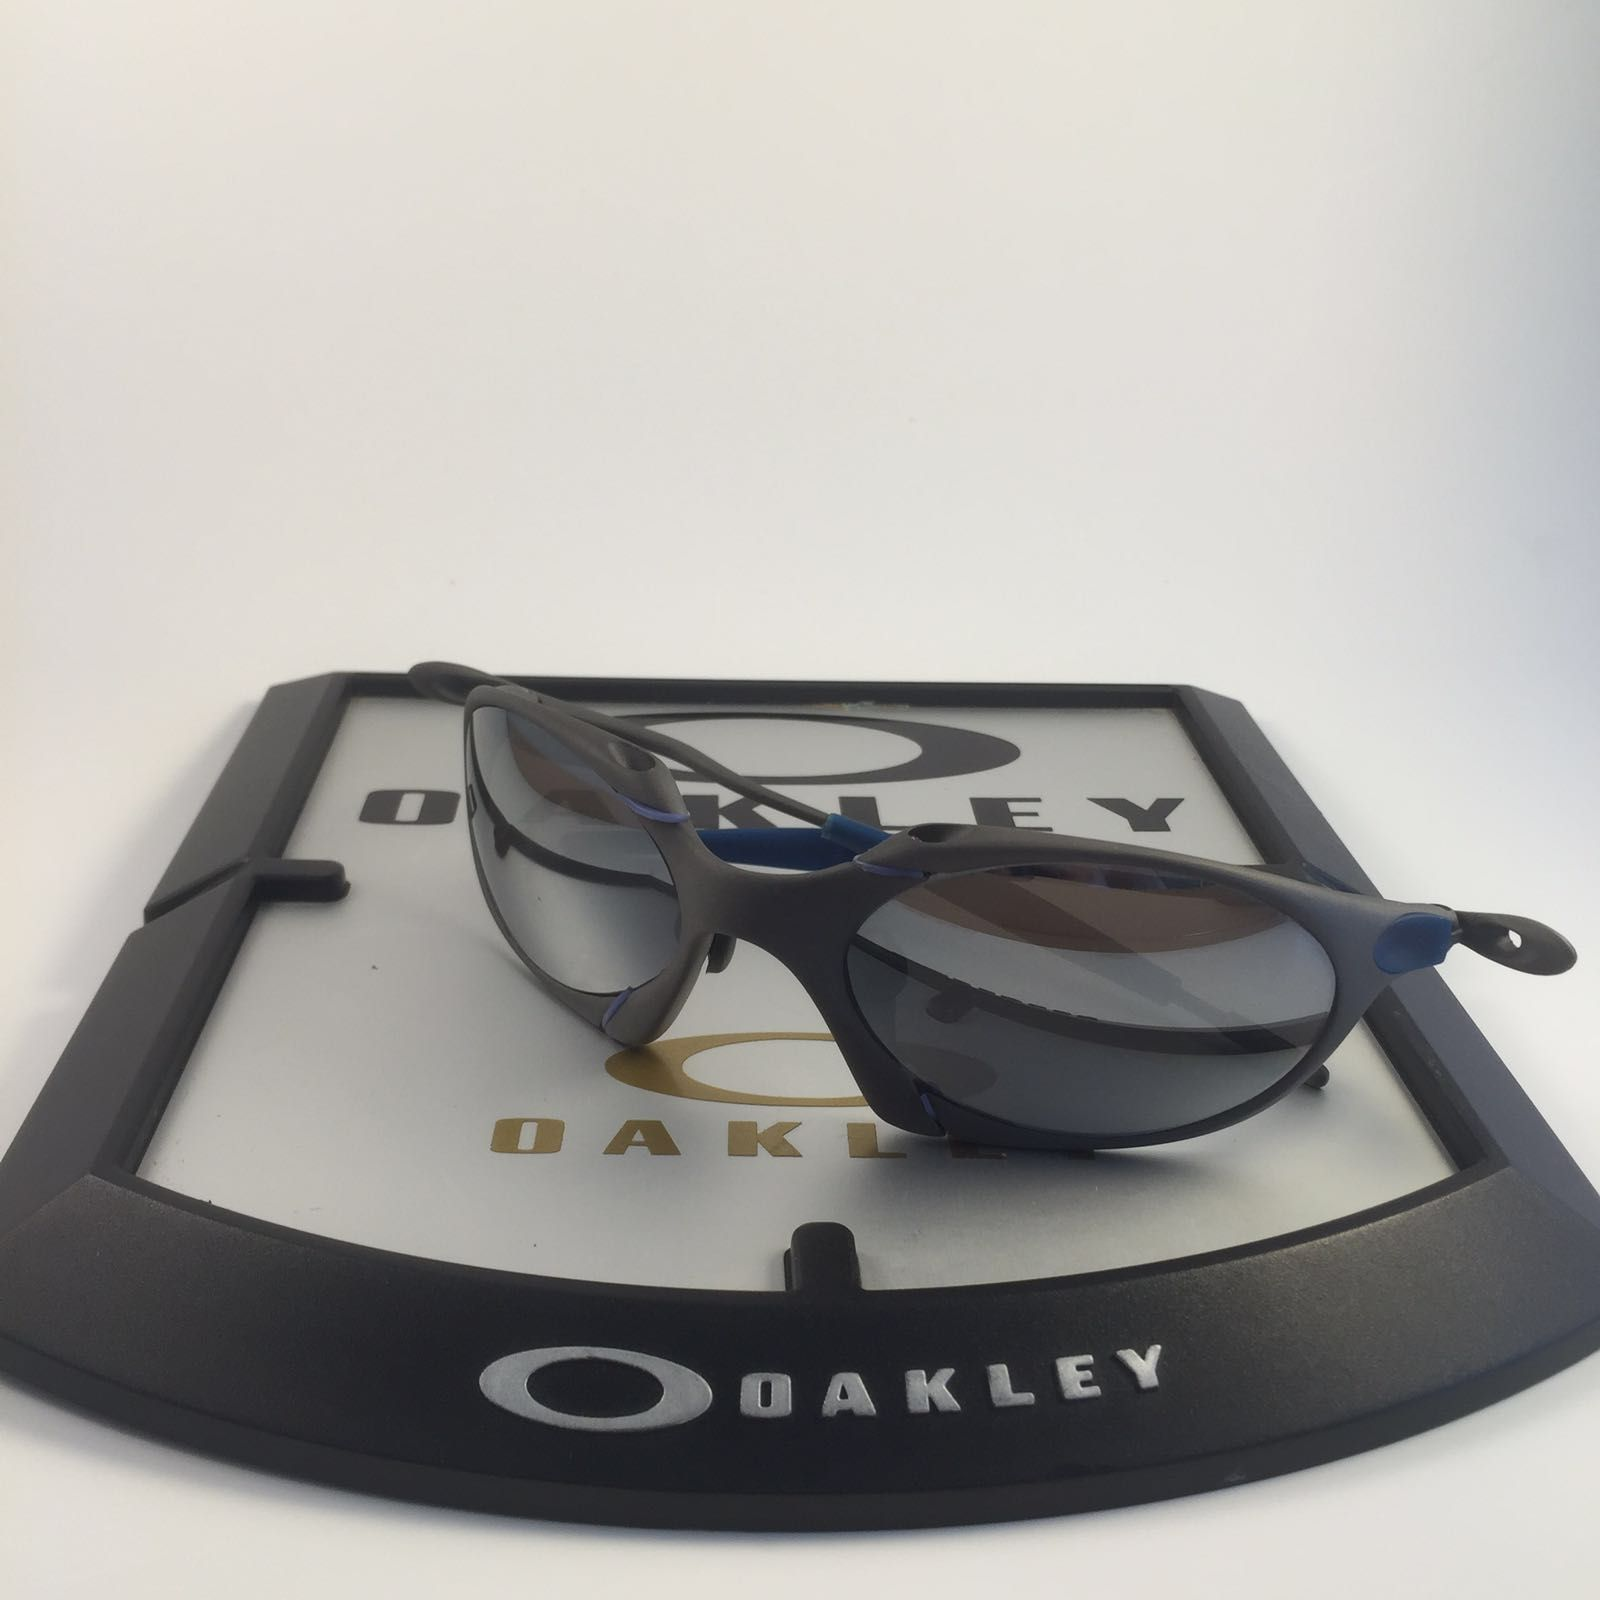 oakley romeo 1 x metal - 7045cdba-fd14-46f9-ba59-0f8b65d789b4.jpeg